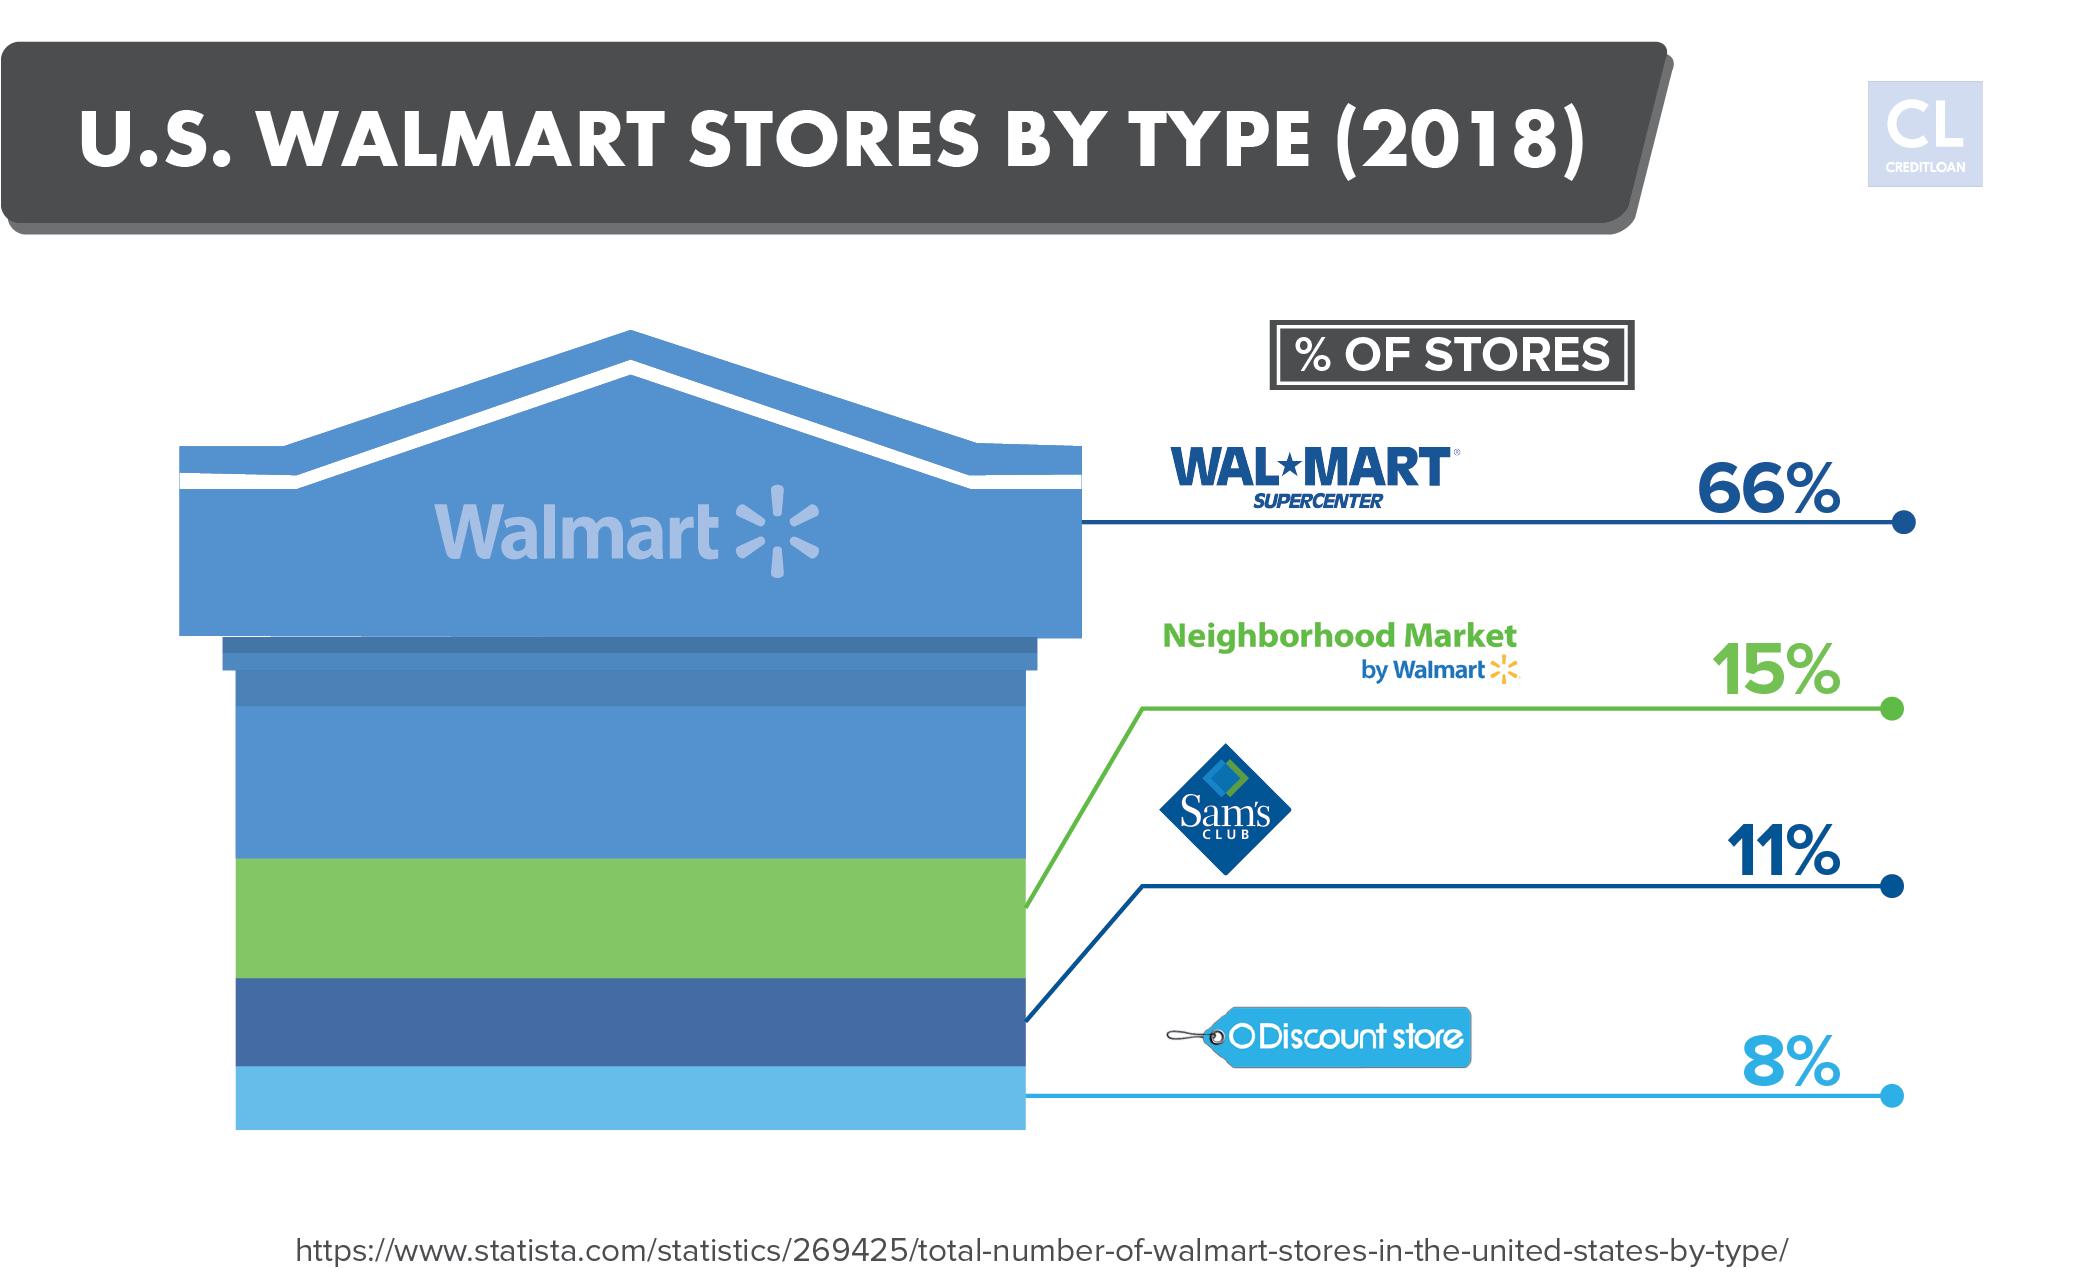 U.S. Walmart Stores by Type 2018